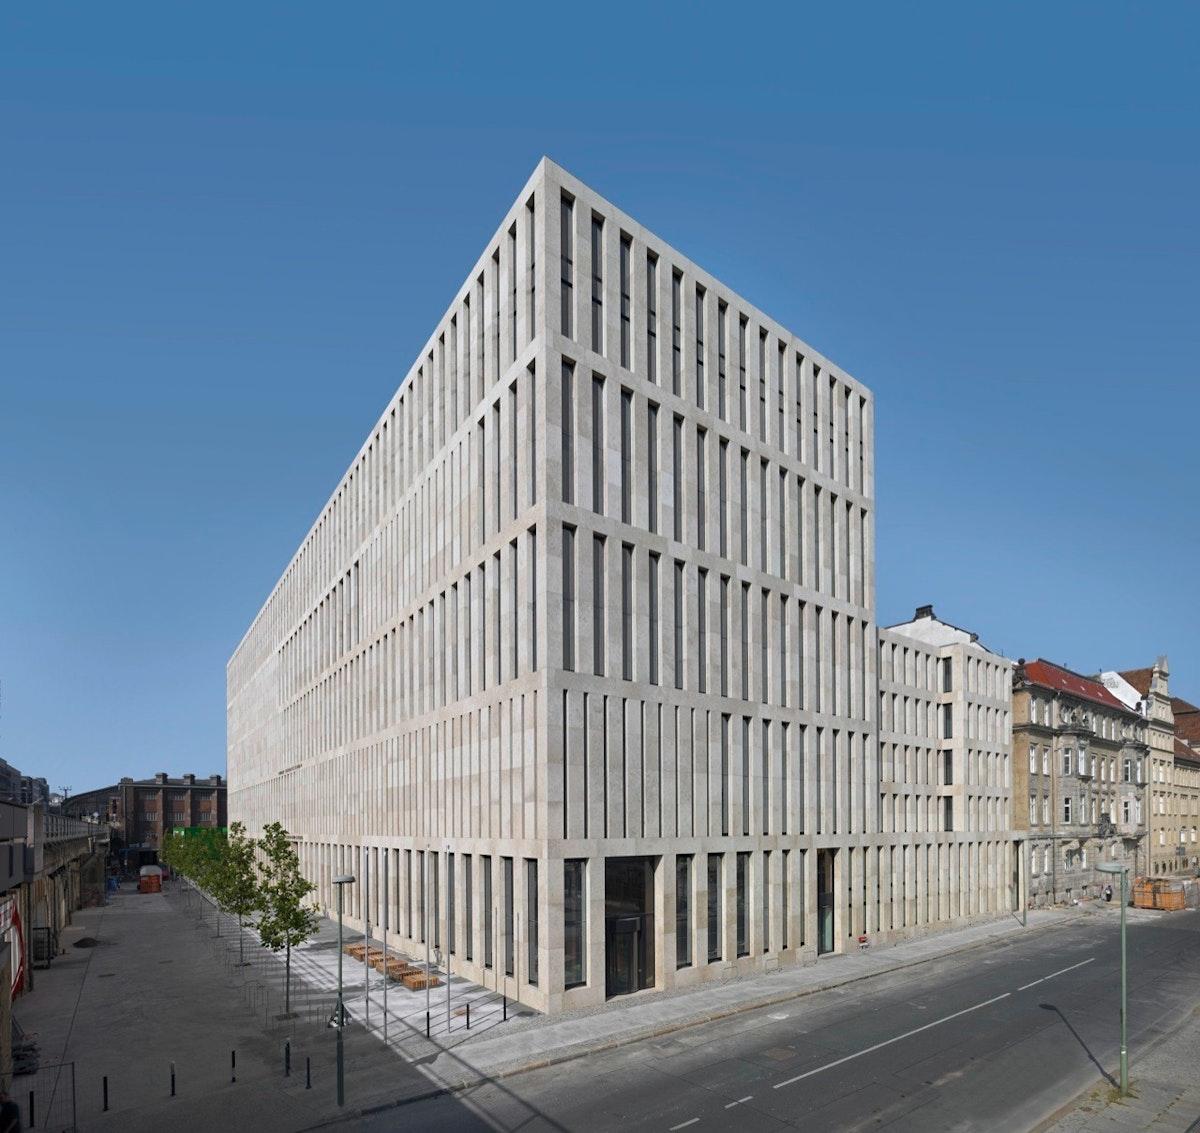 Jacob und Wilhelm Grimm Zentrum, Berlin